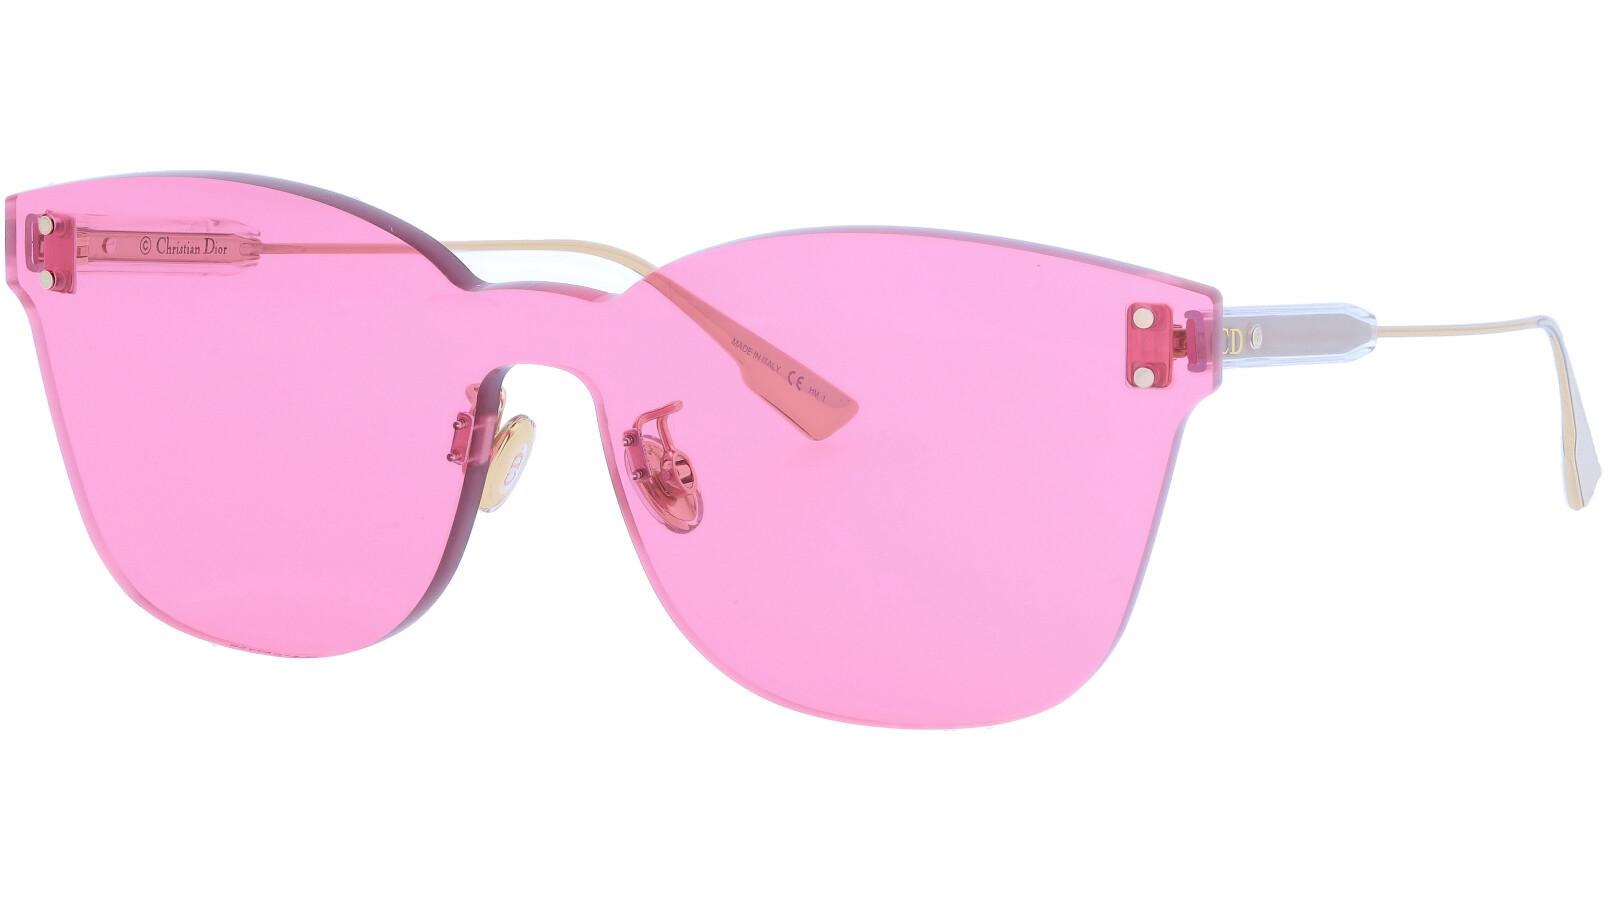 DIOR DIORCOLORQUAKE2 FWMVC 99 NUDE Sunglasses